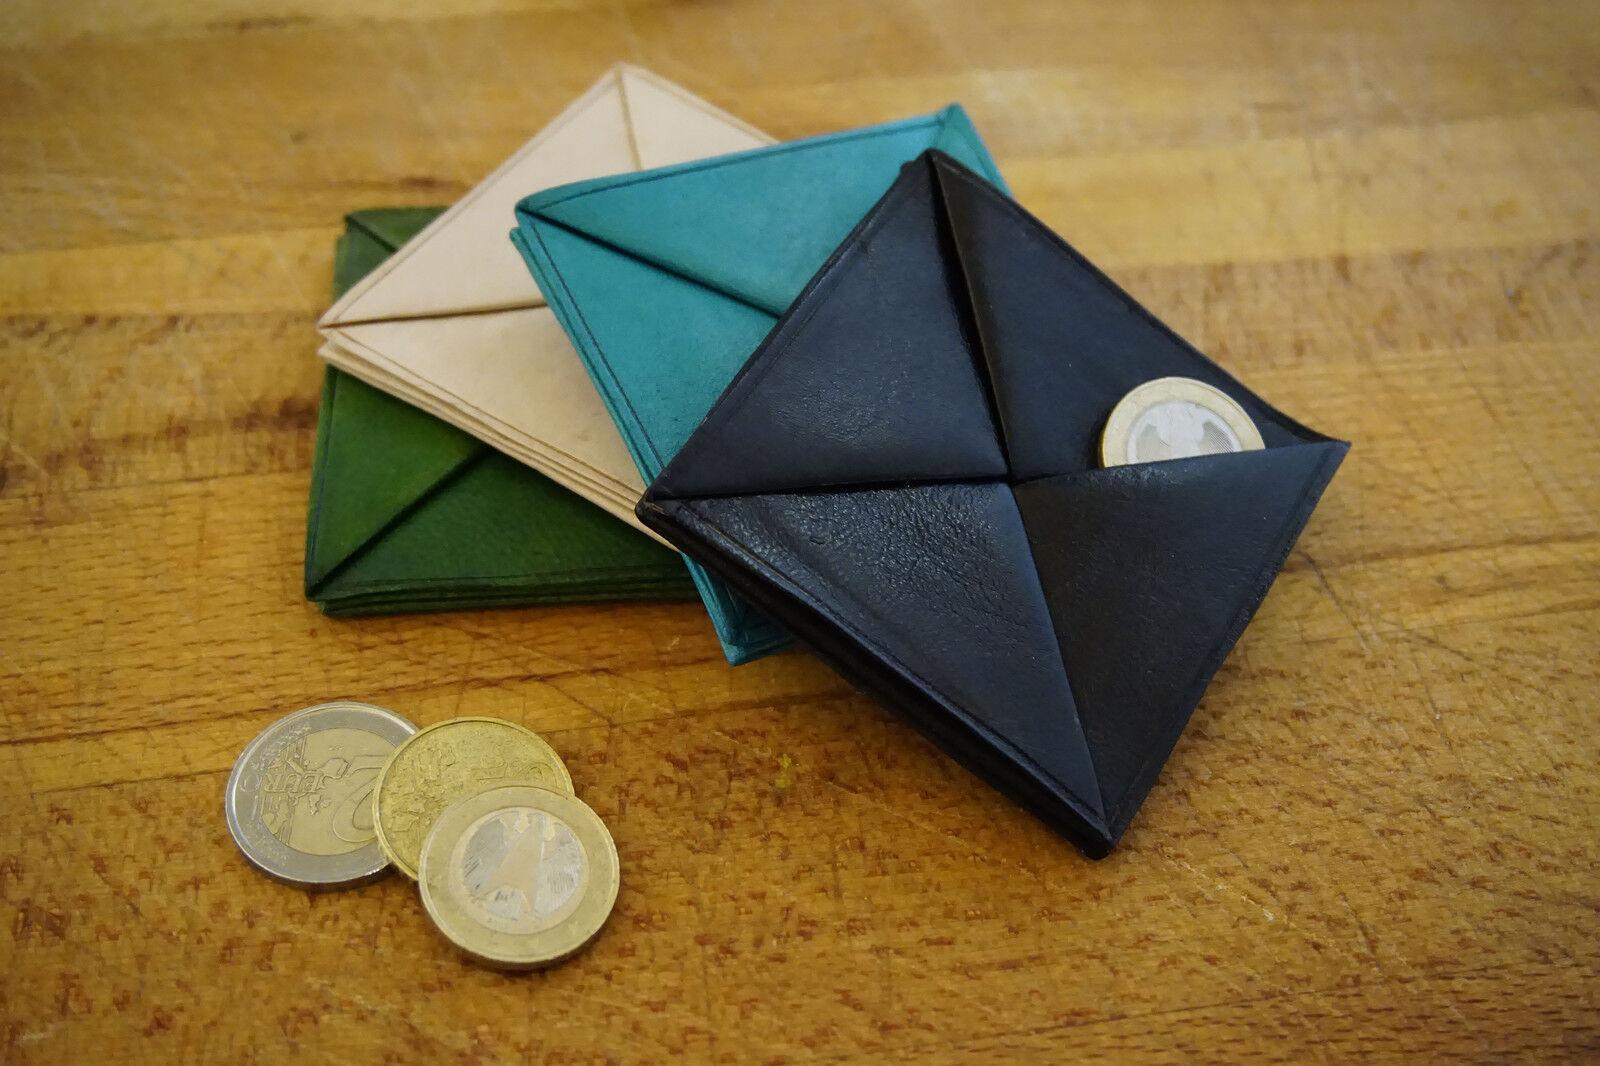 Echtleder Geldbeutel, versch. Farben, Handarbeit